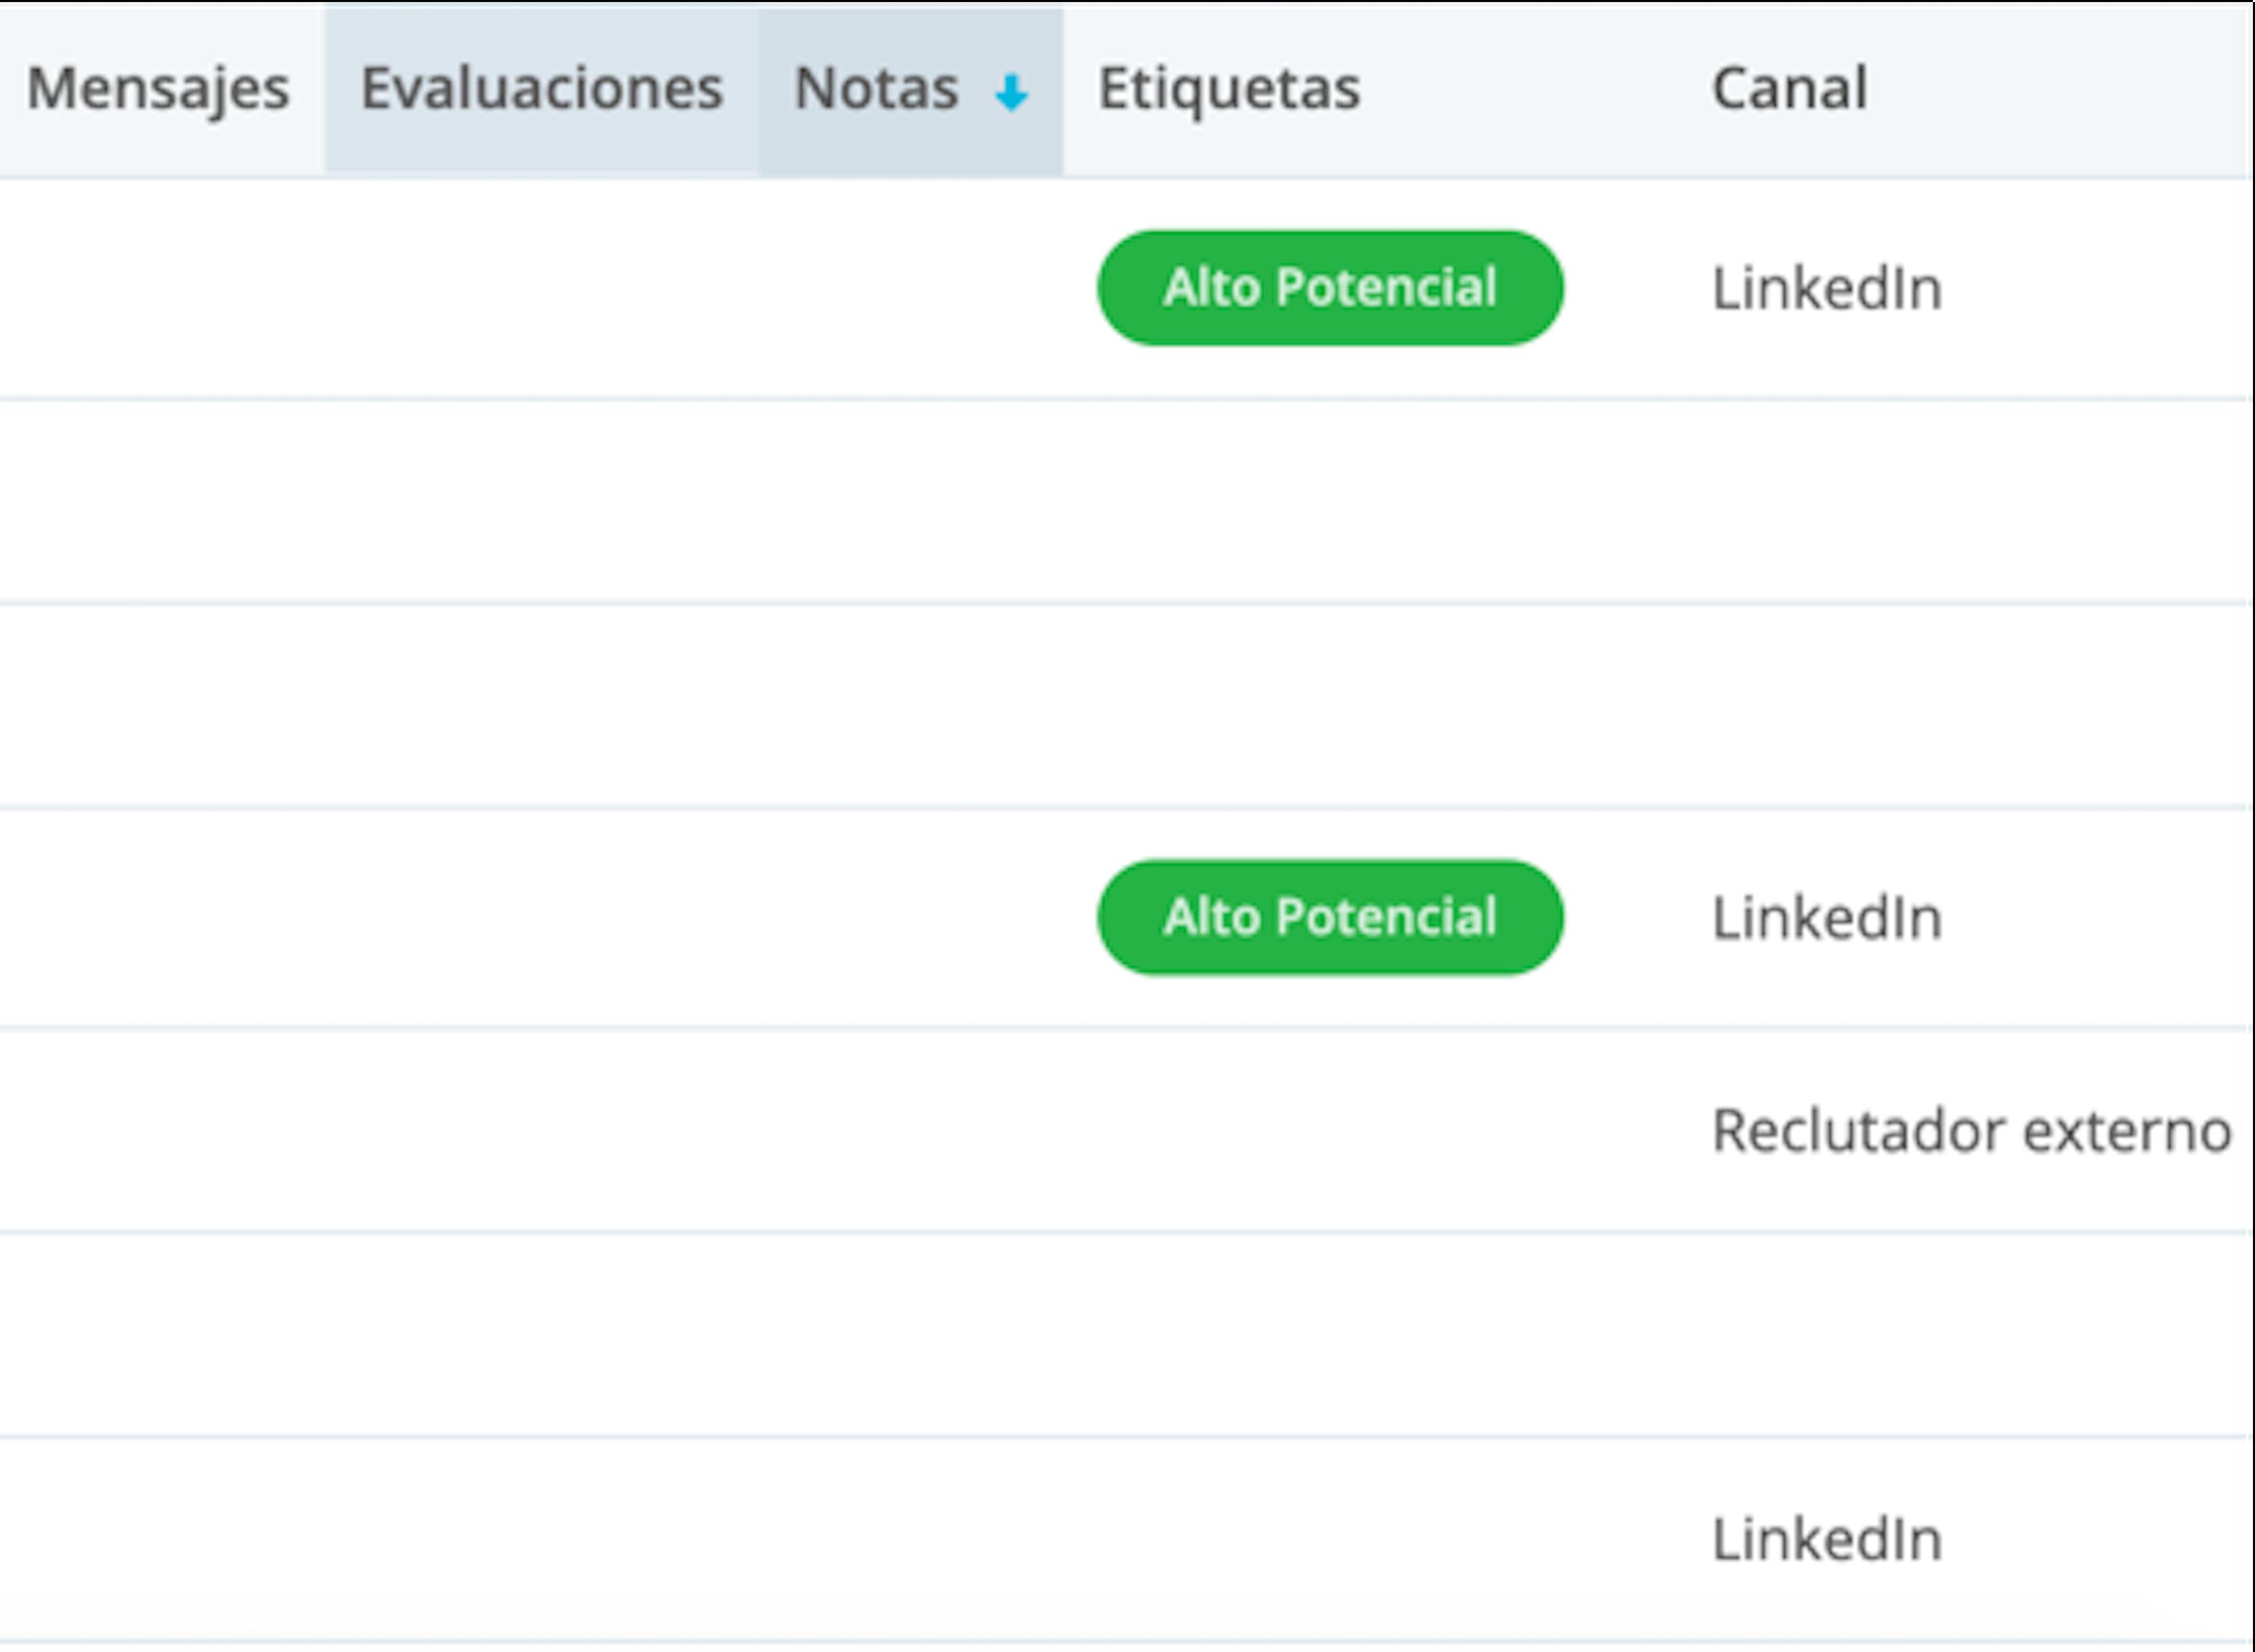 application-list_messages_evaluations_notes_es.png